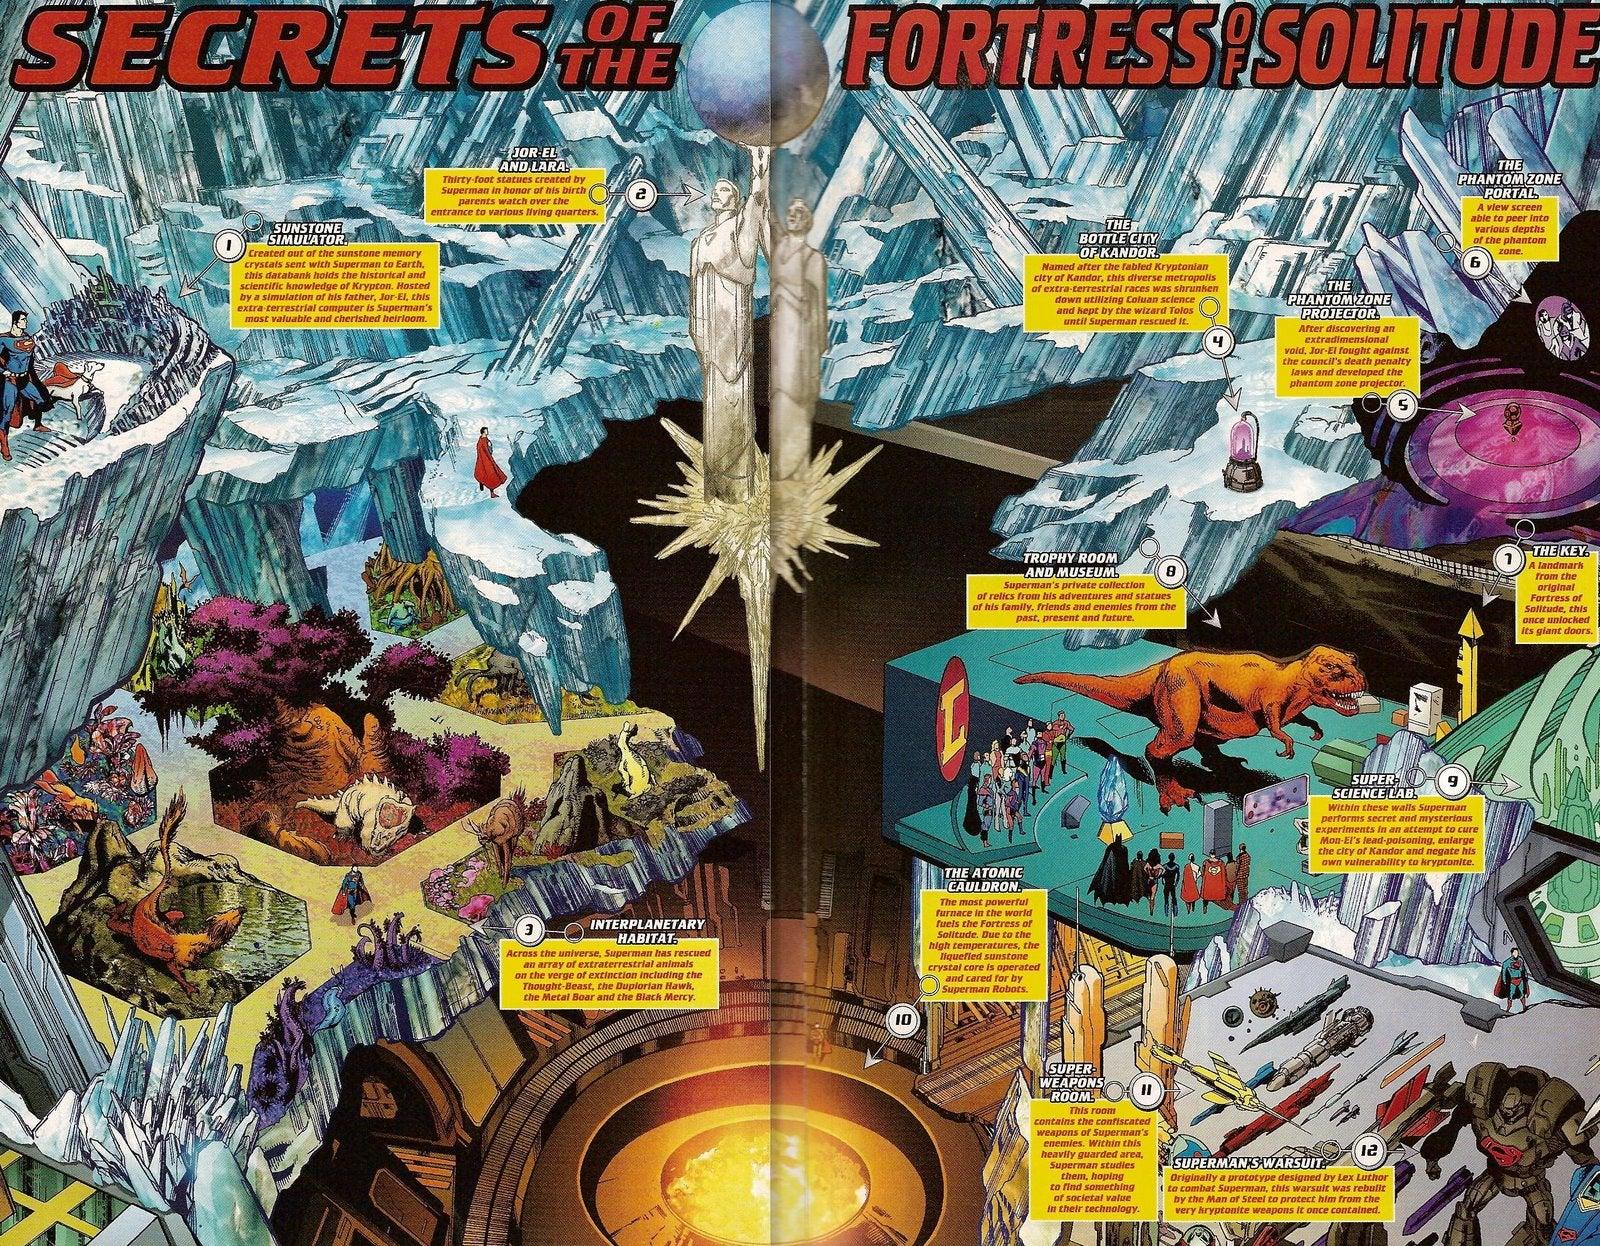 Les Ferrailleurs de la forteresse Fortress-of-solitude-new-earth-005-164181